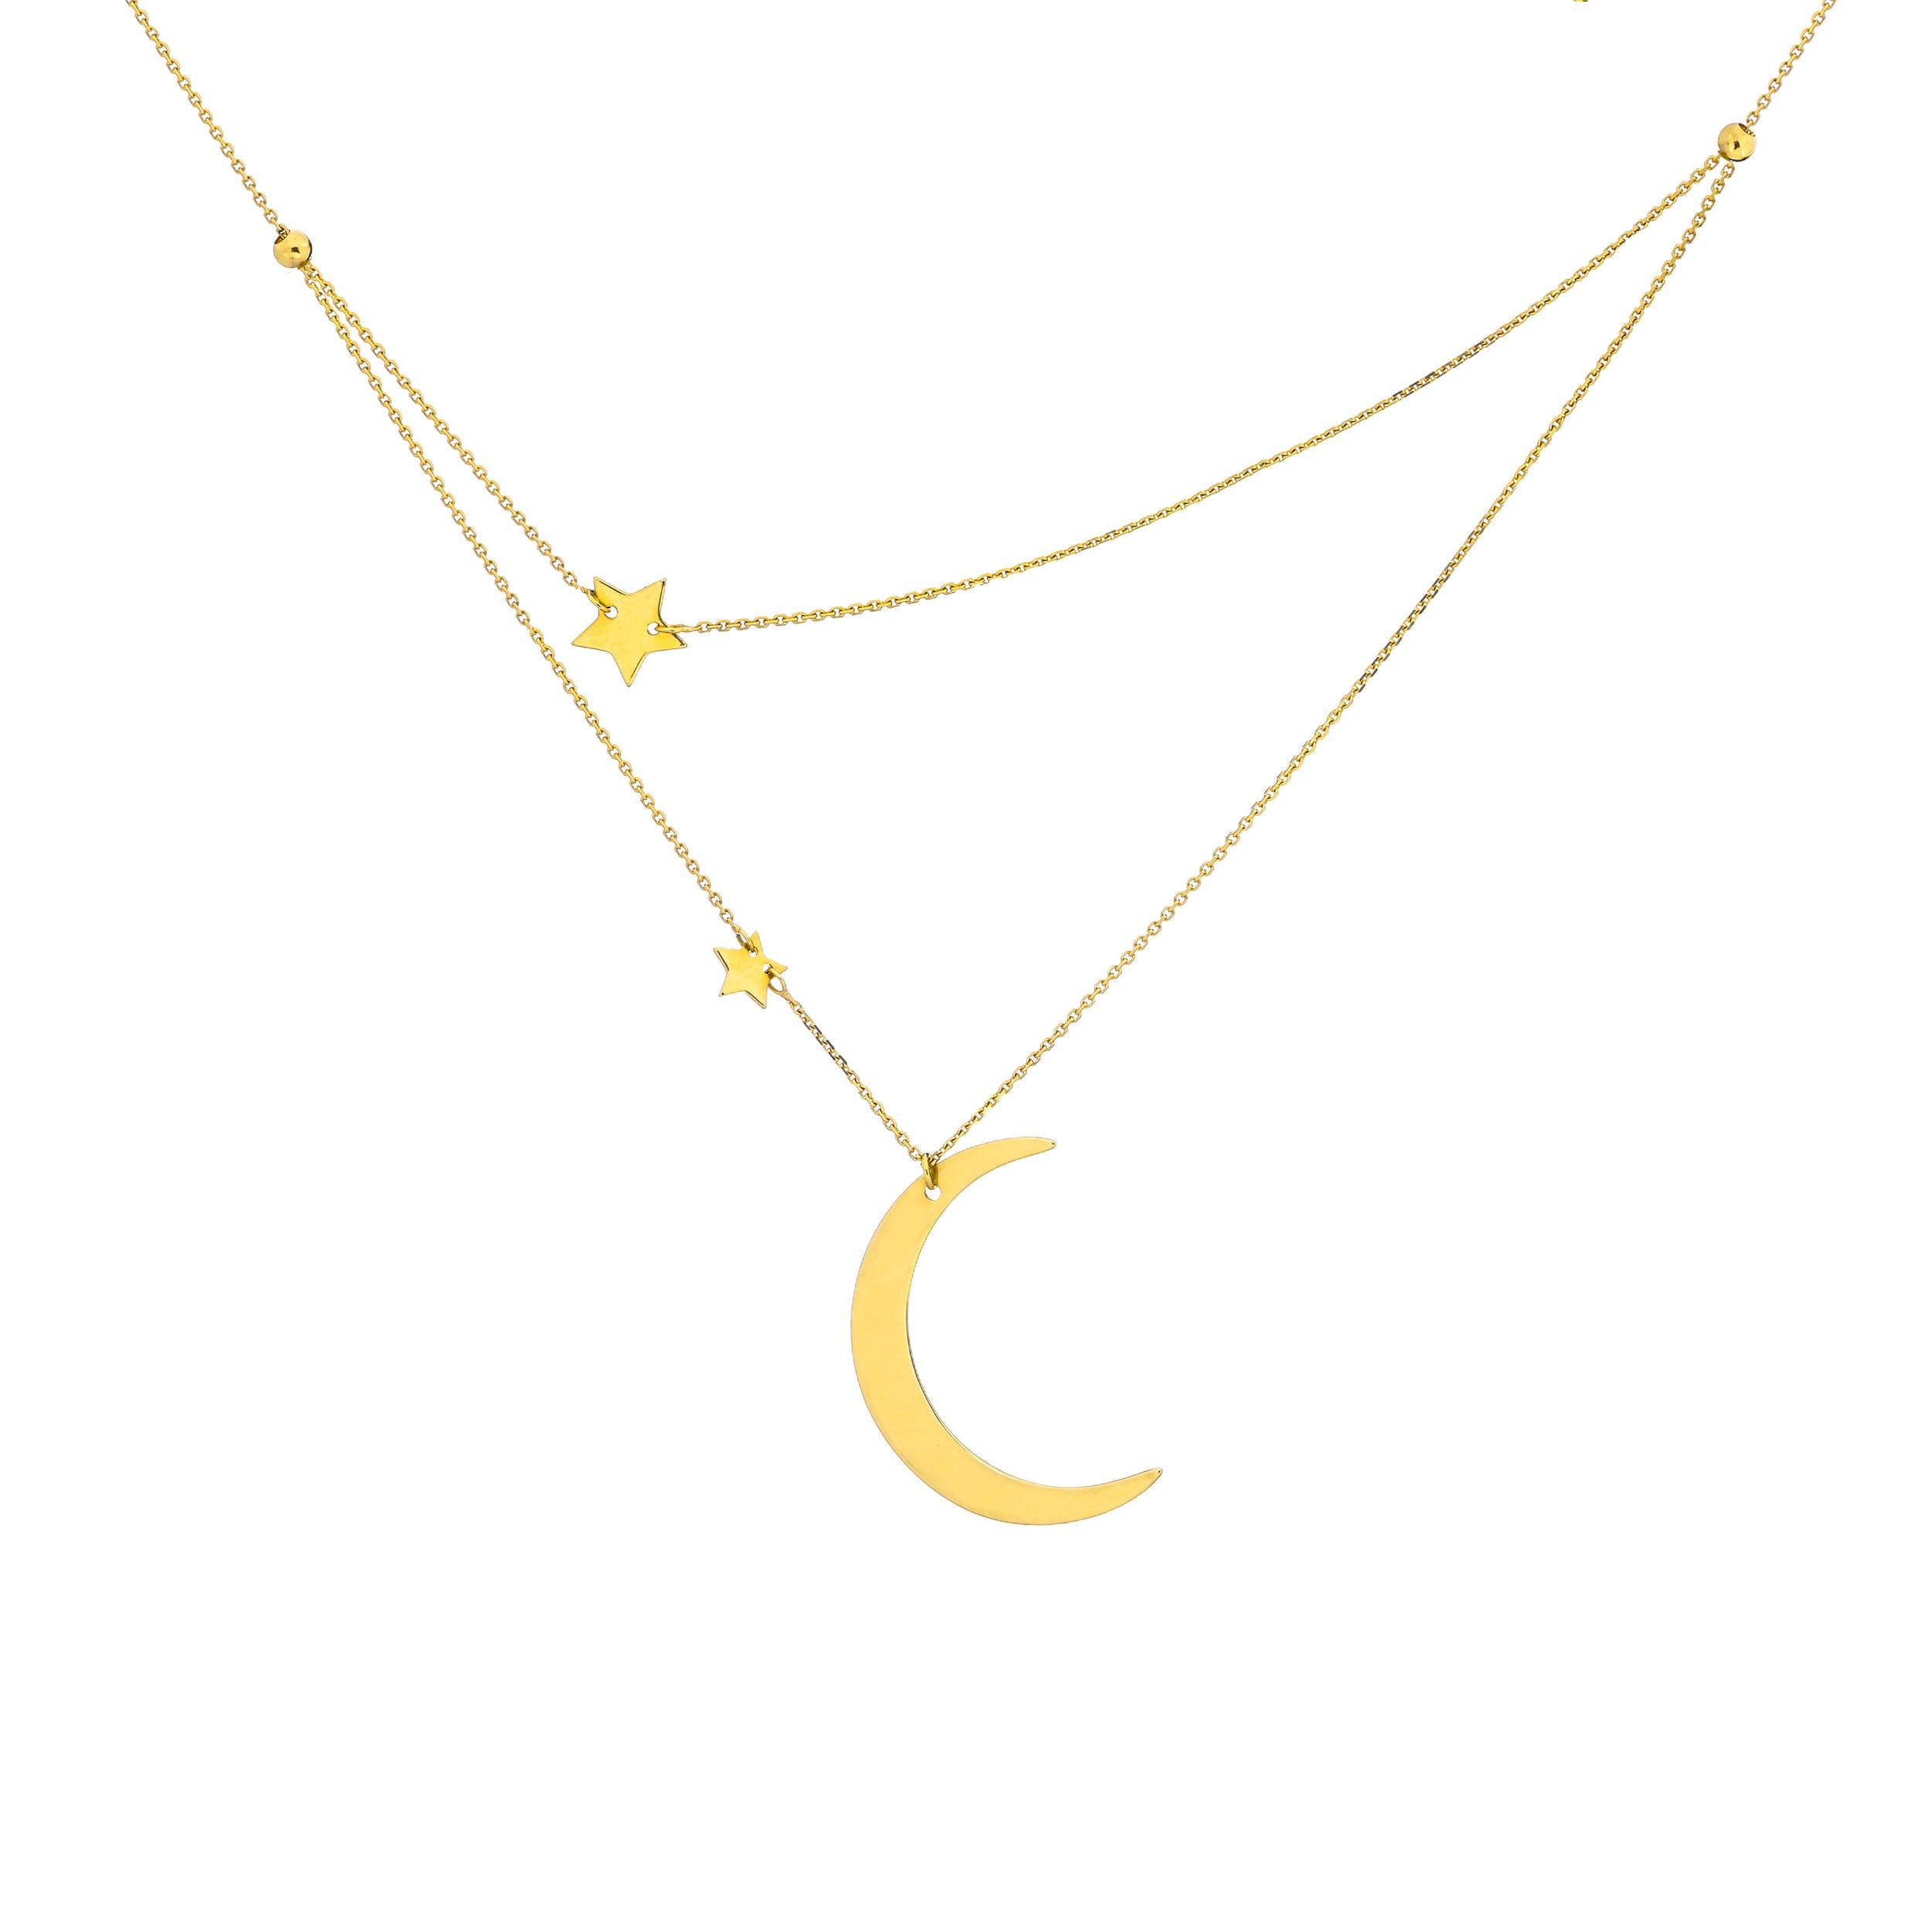 98378660c421b2 Ladies Half Moon & Stars Double Layer Adjustable Necklace in 14k ...